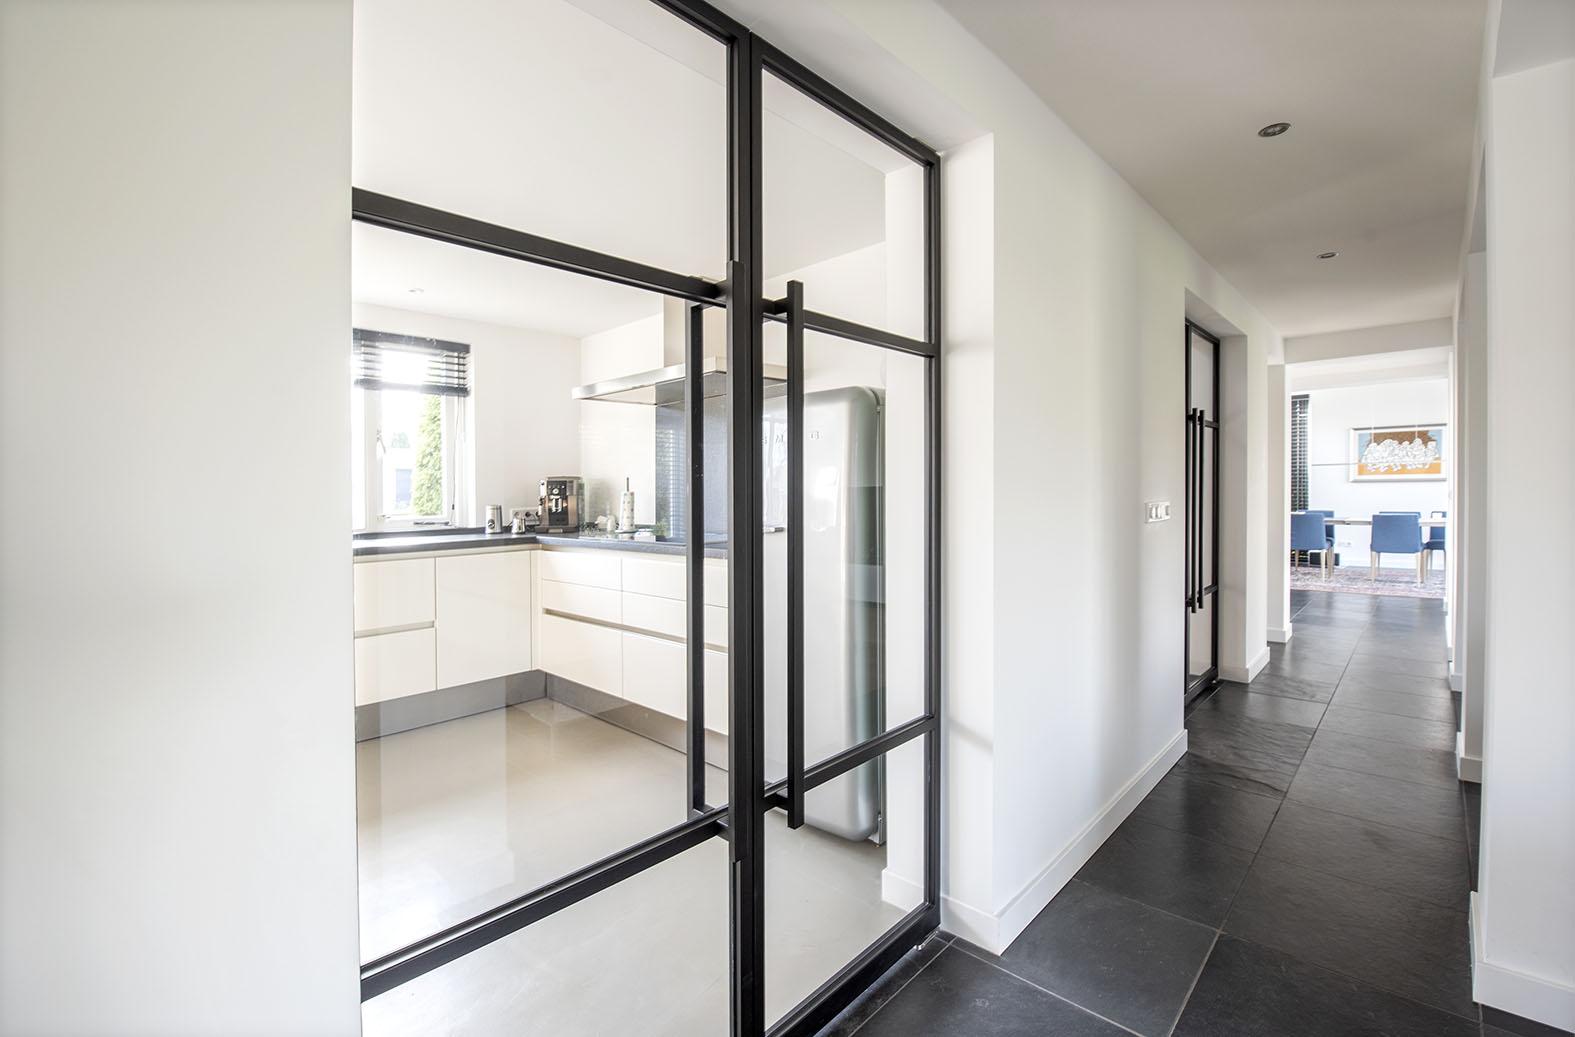 entree hal interieuradvies Den Bosch Engelen zwart stalen deuren zwarte trap kleuradvies vrijstaande woning stylen